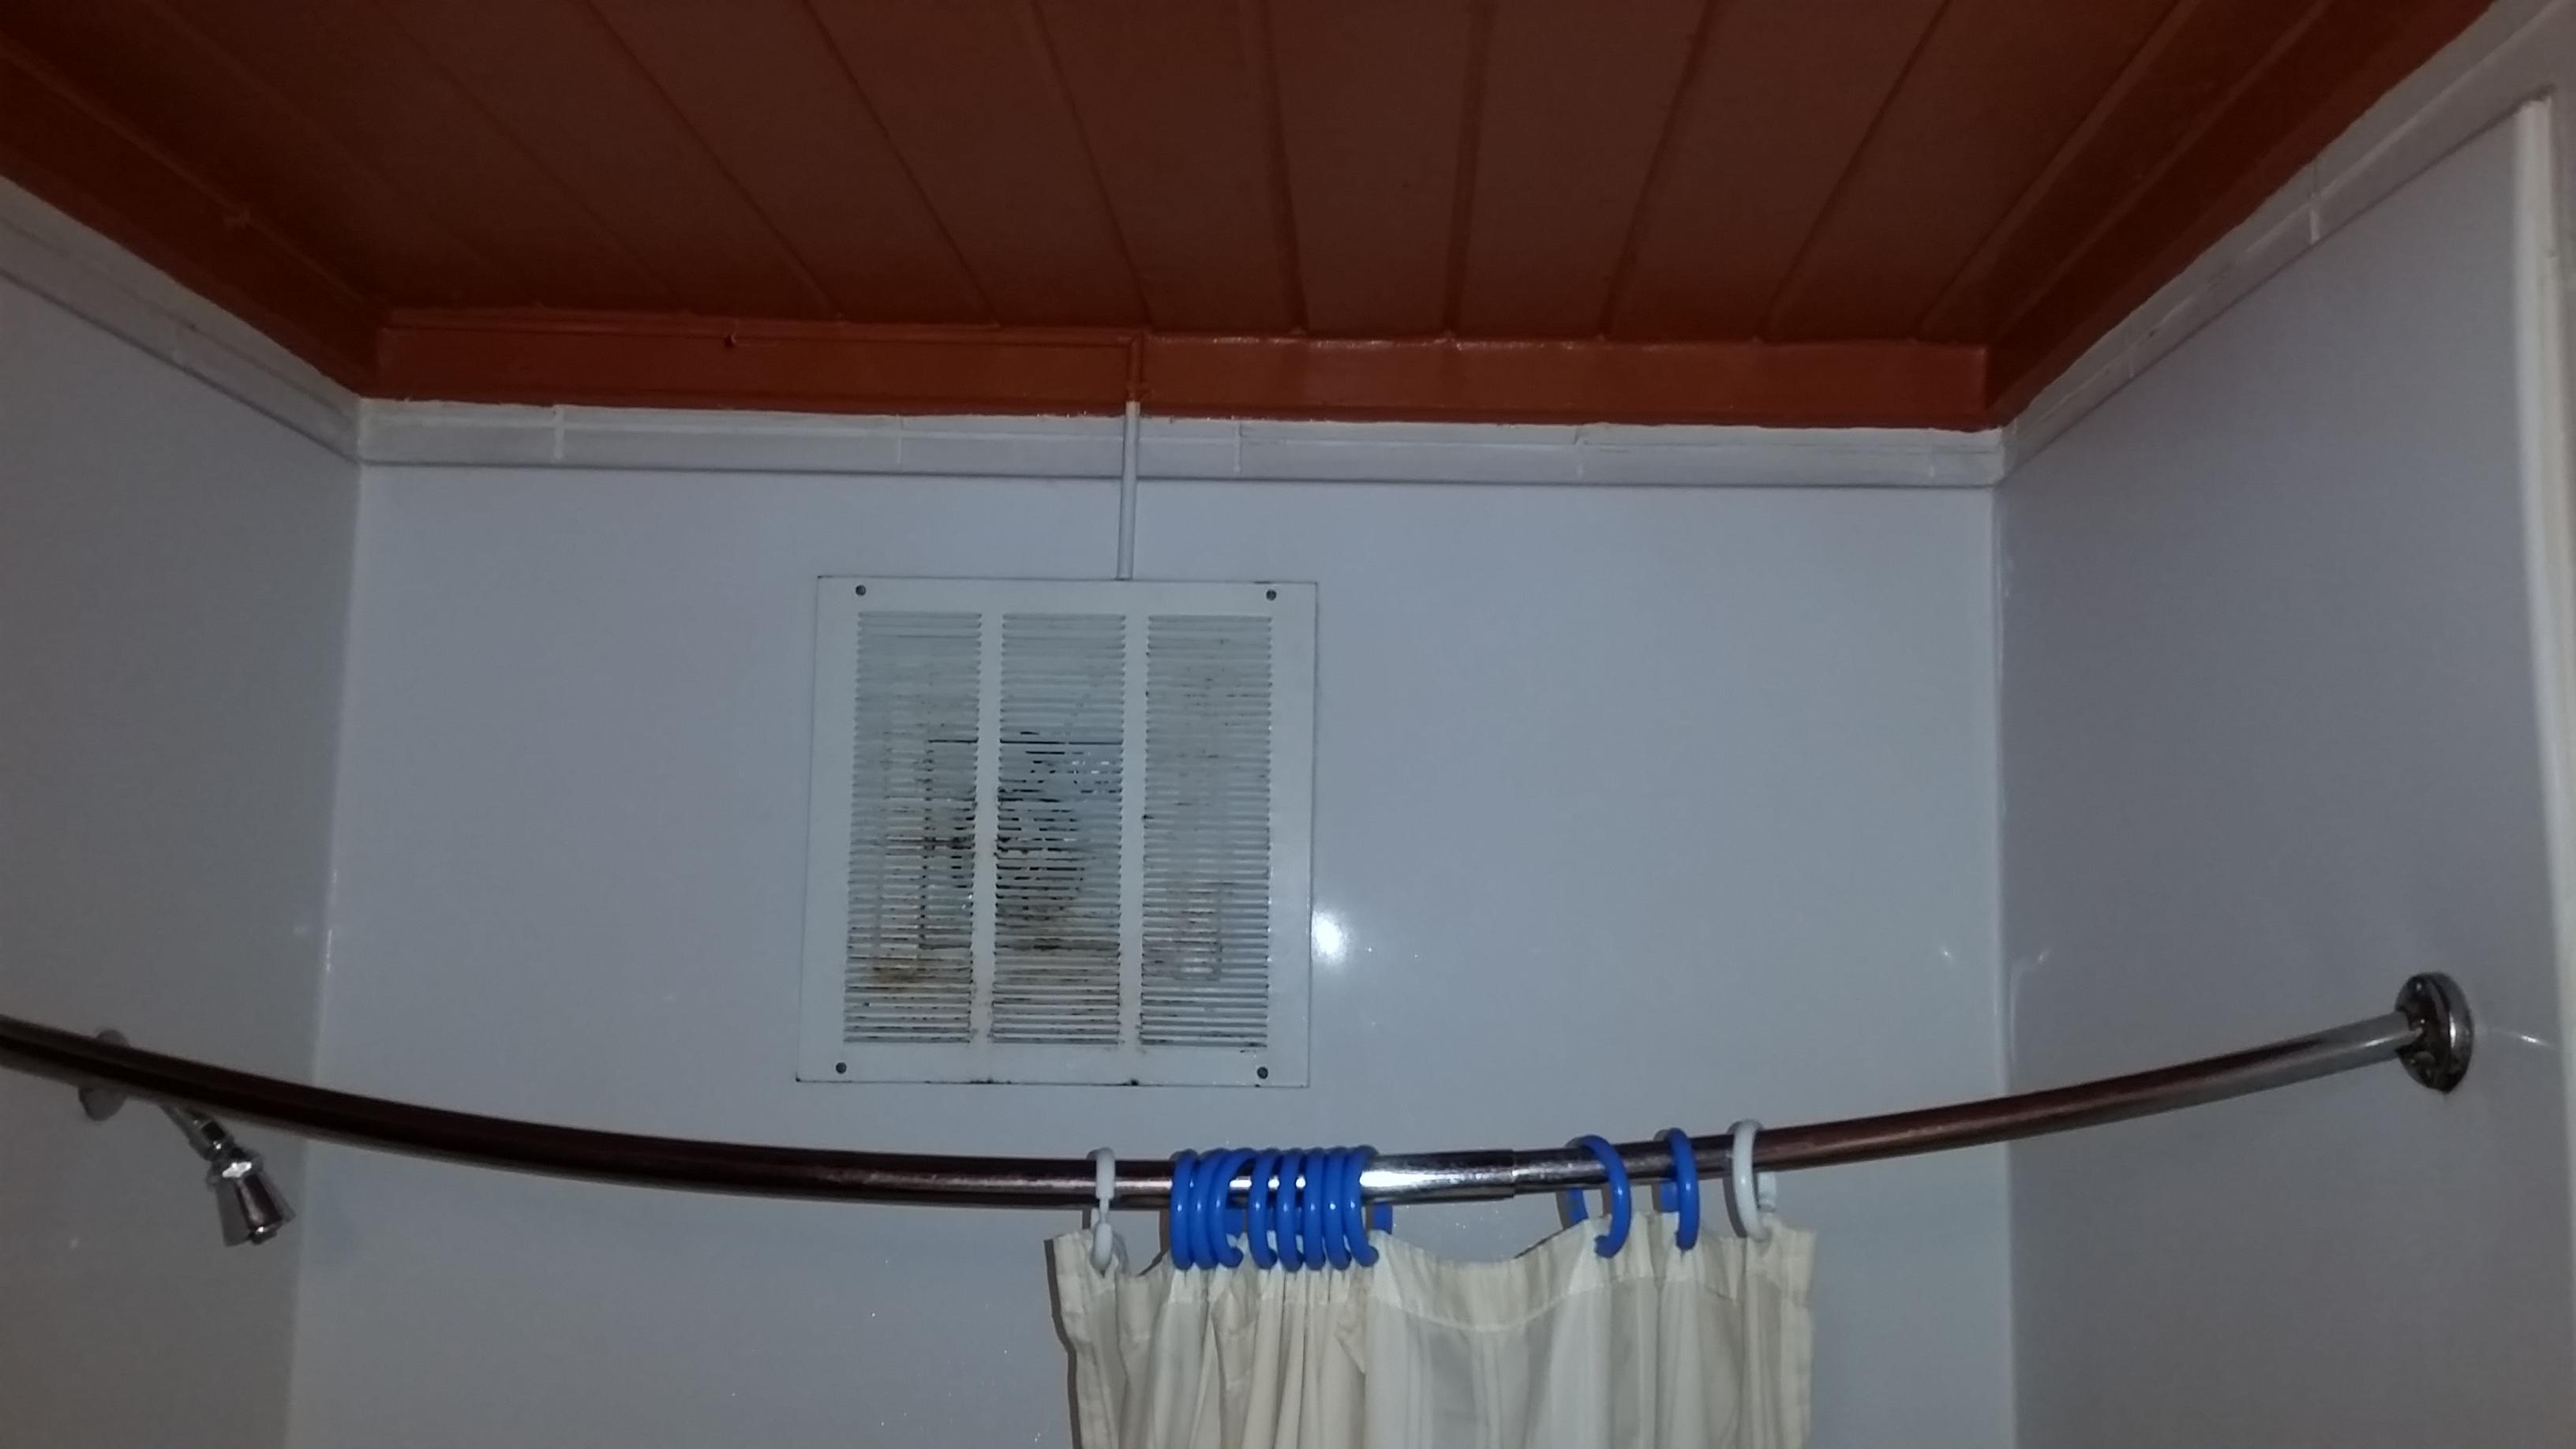 Sad shower curtain.